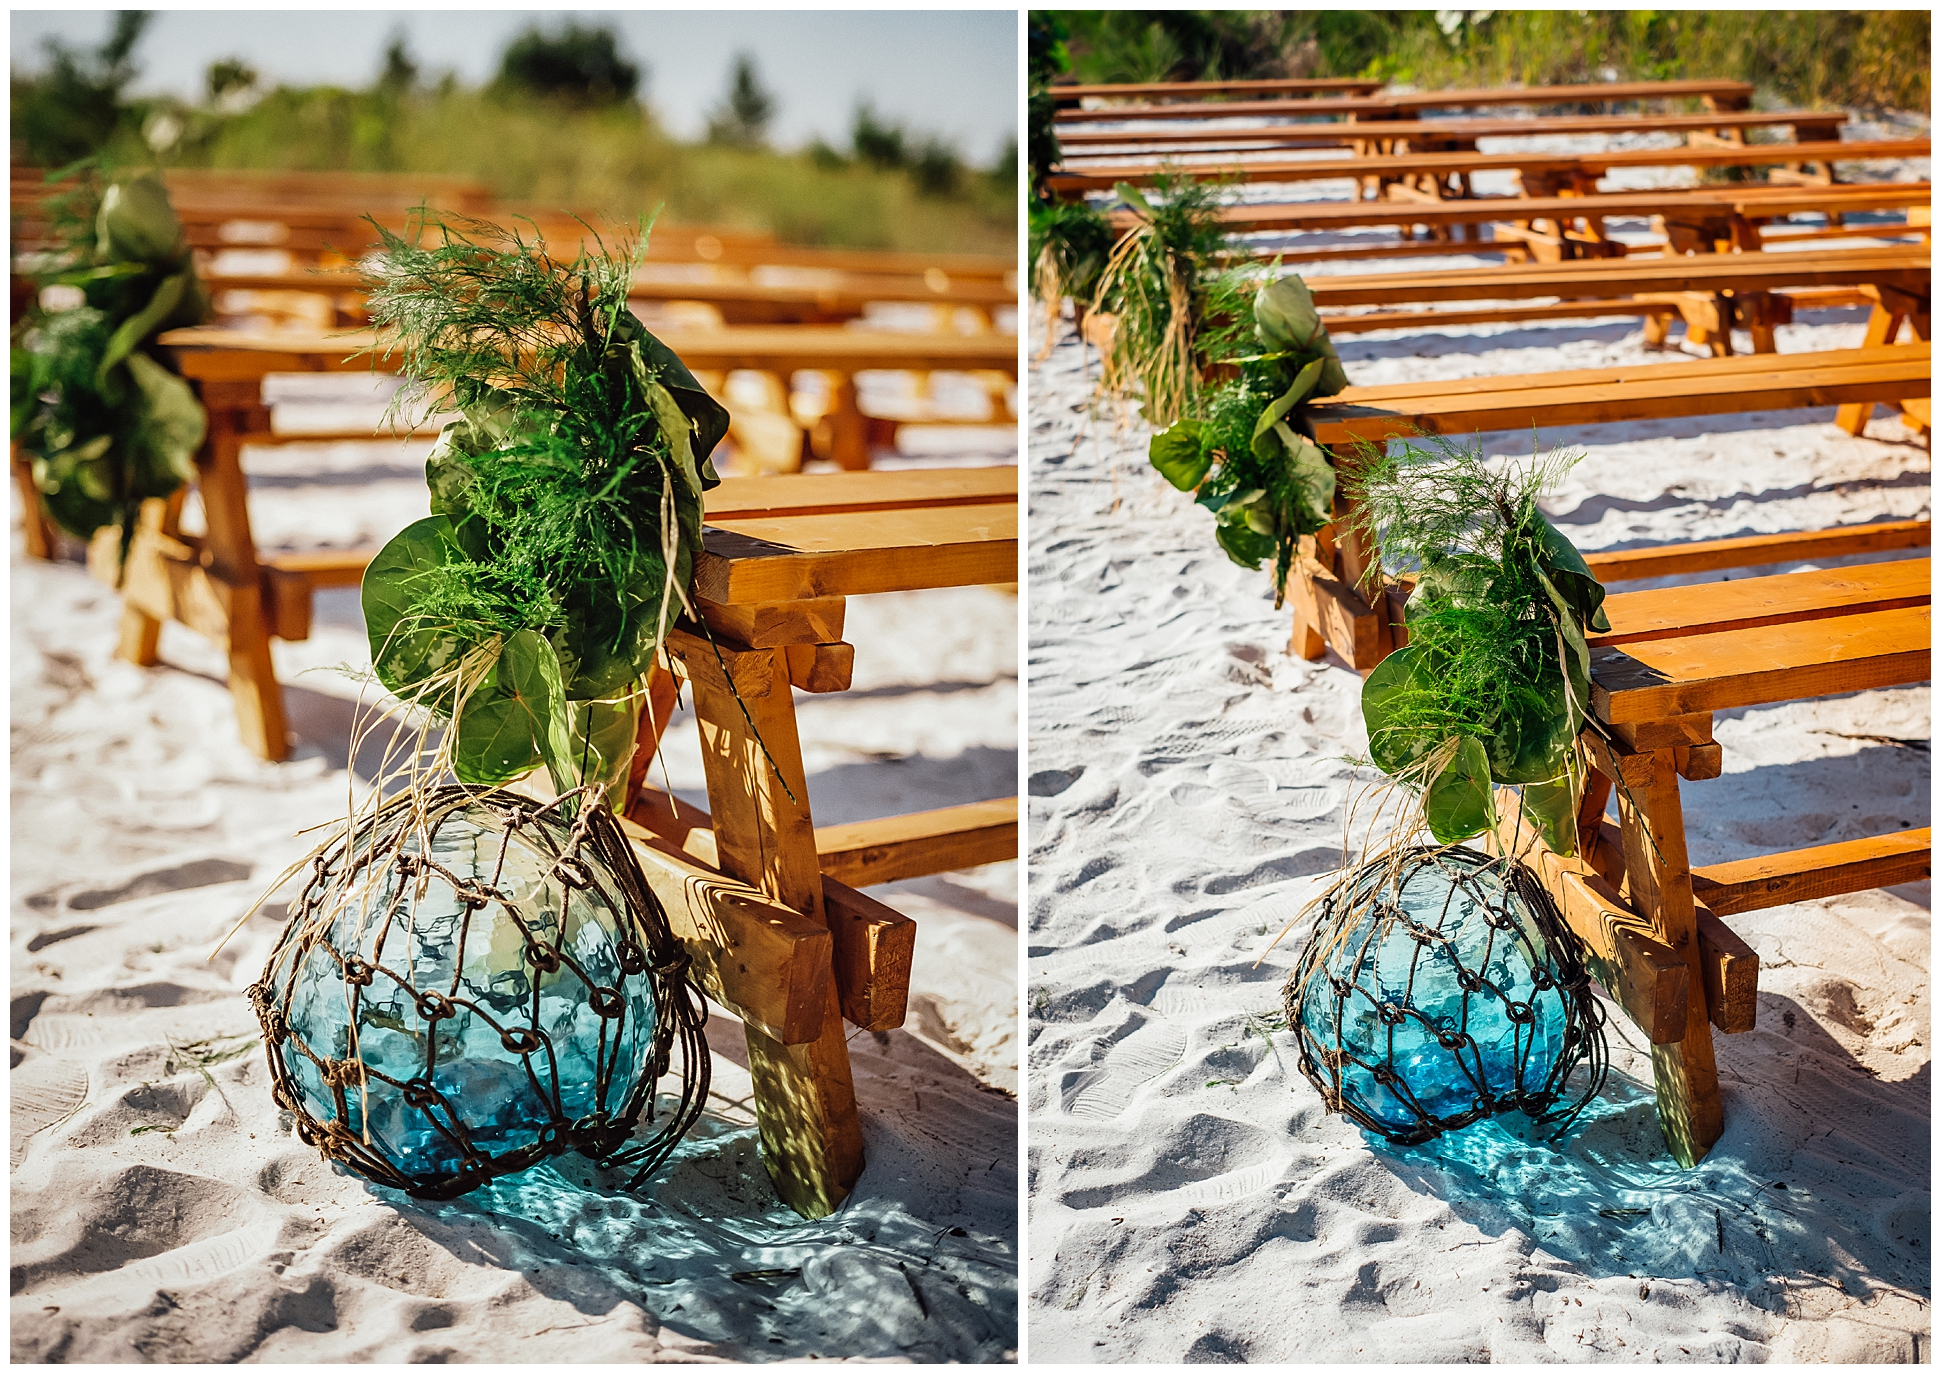 medium-format-film-vs-digital-wedding-photography-florida-beach_0007.jpg